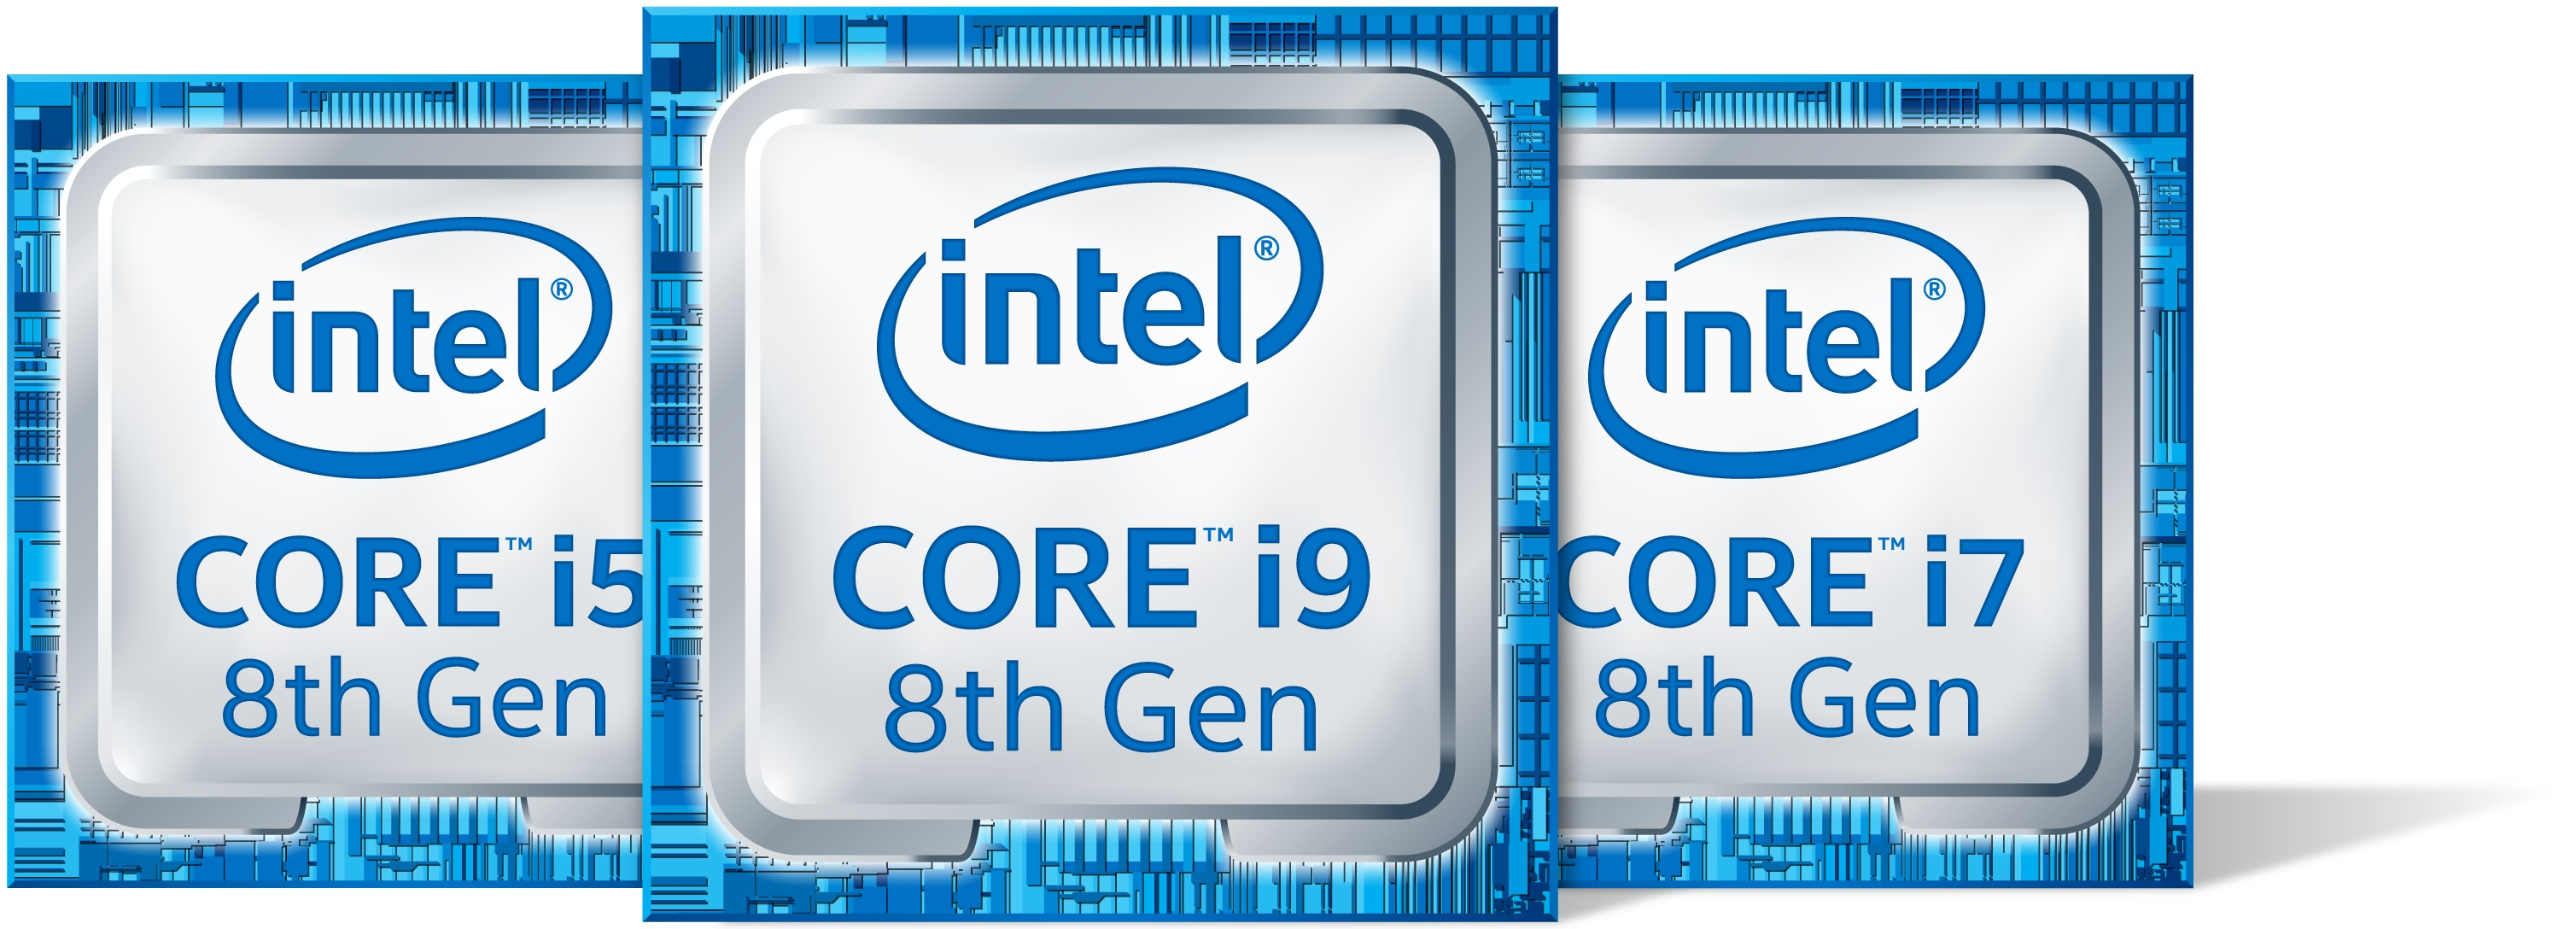 Intel unveils Core i9 laptop CPU, promises 'ultimate